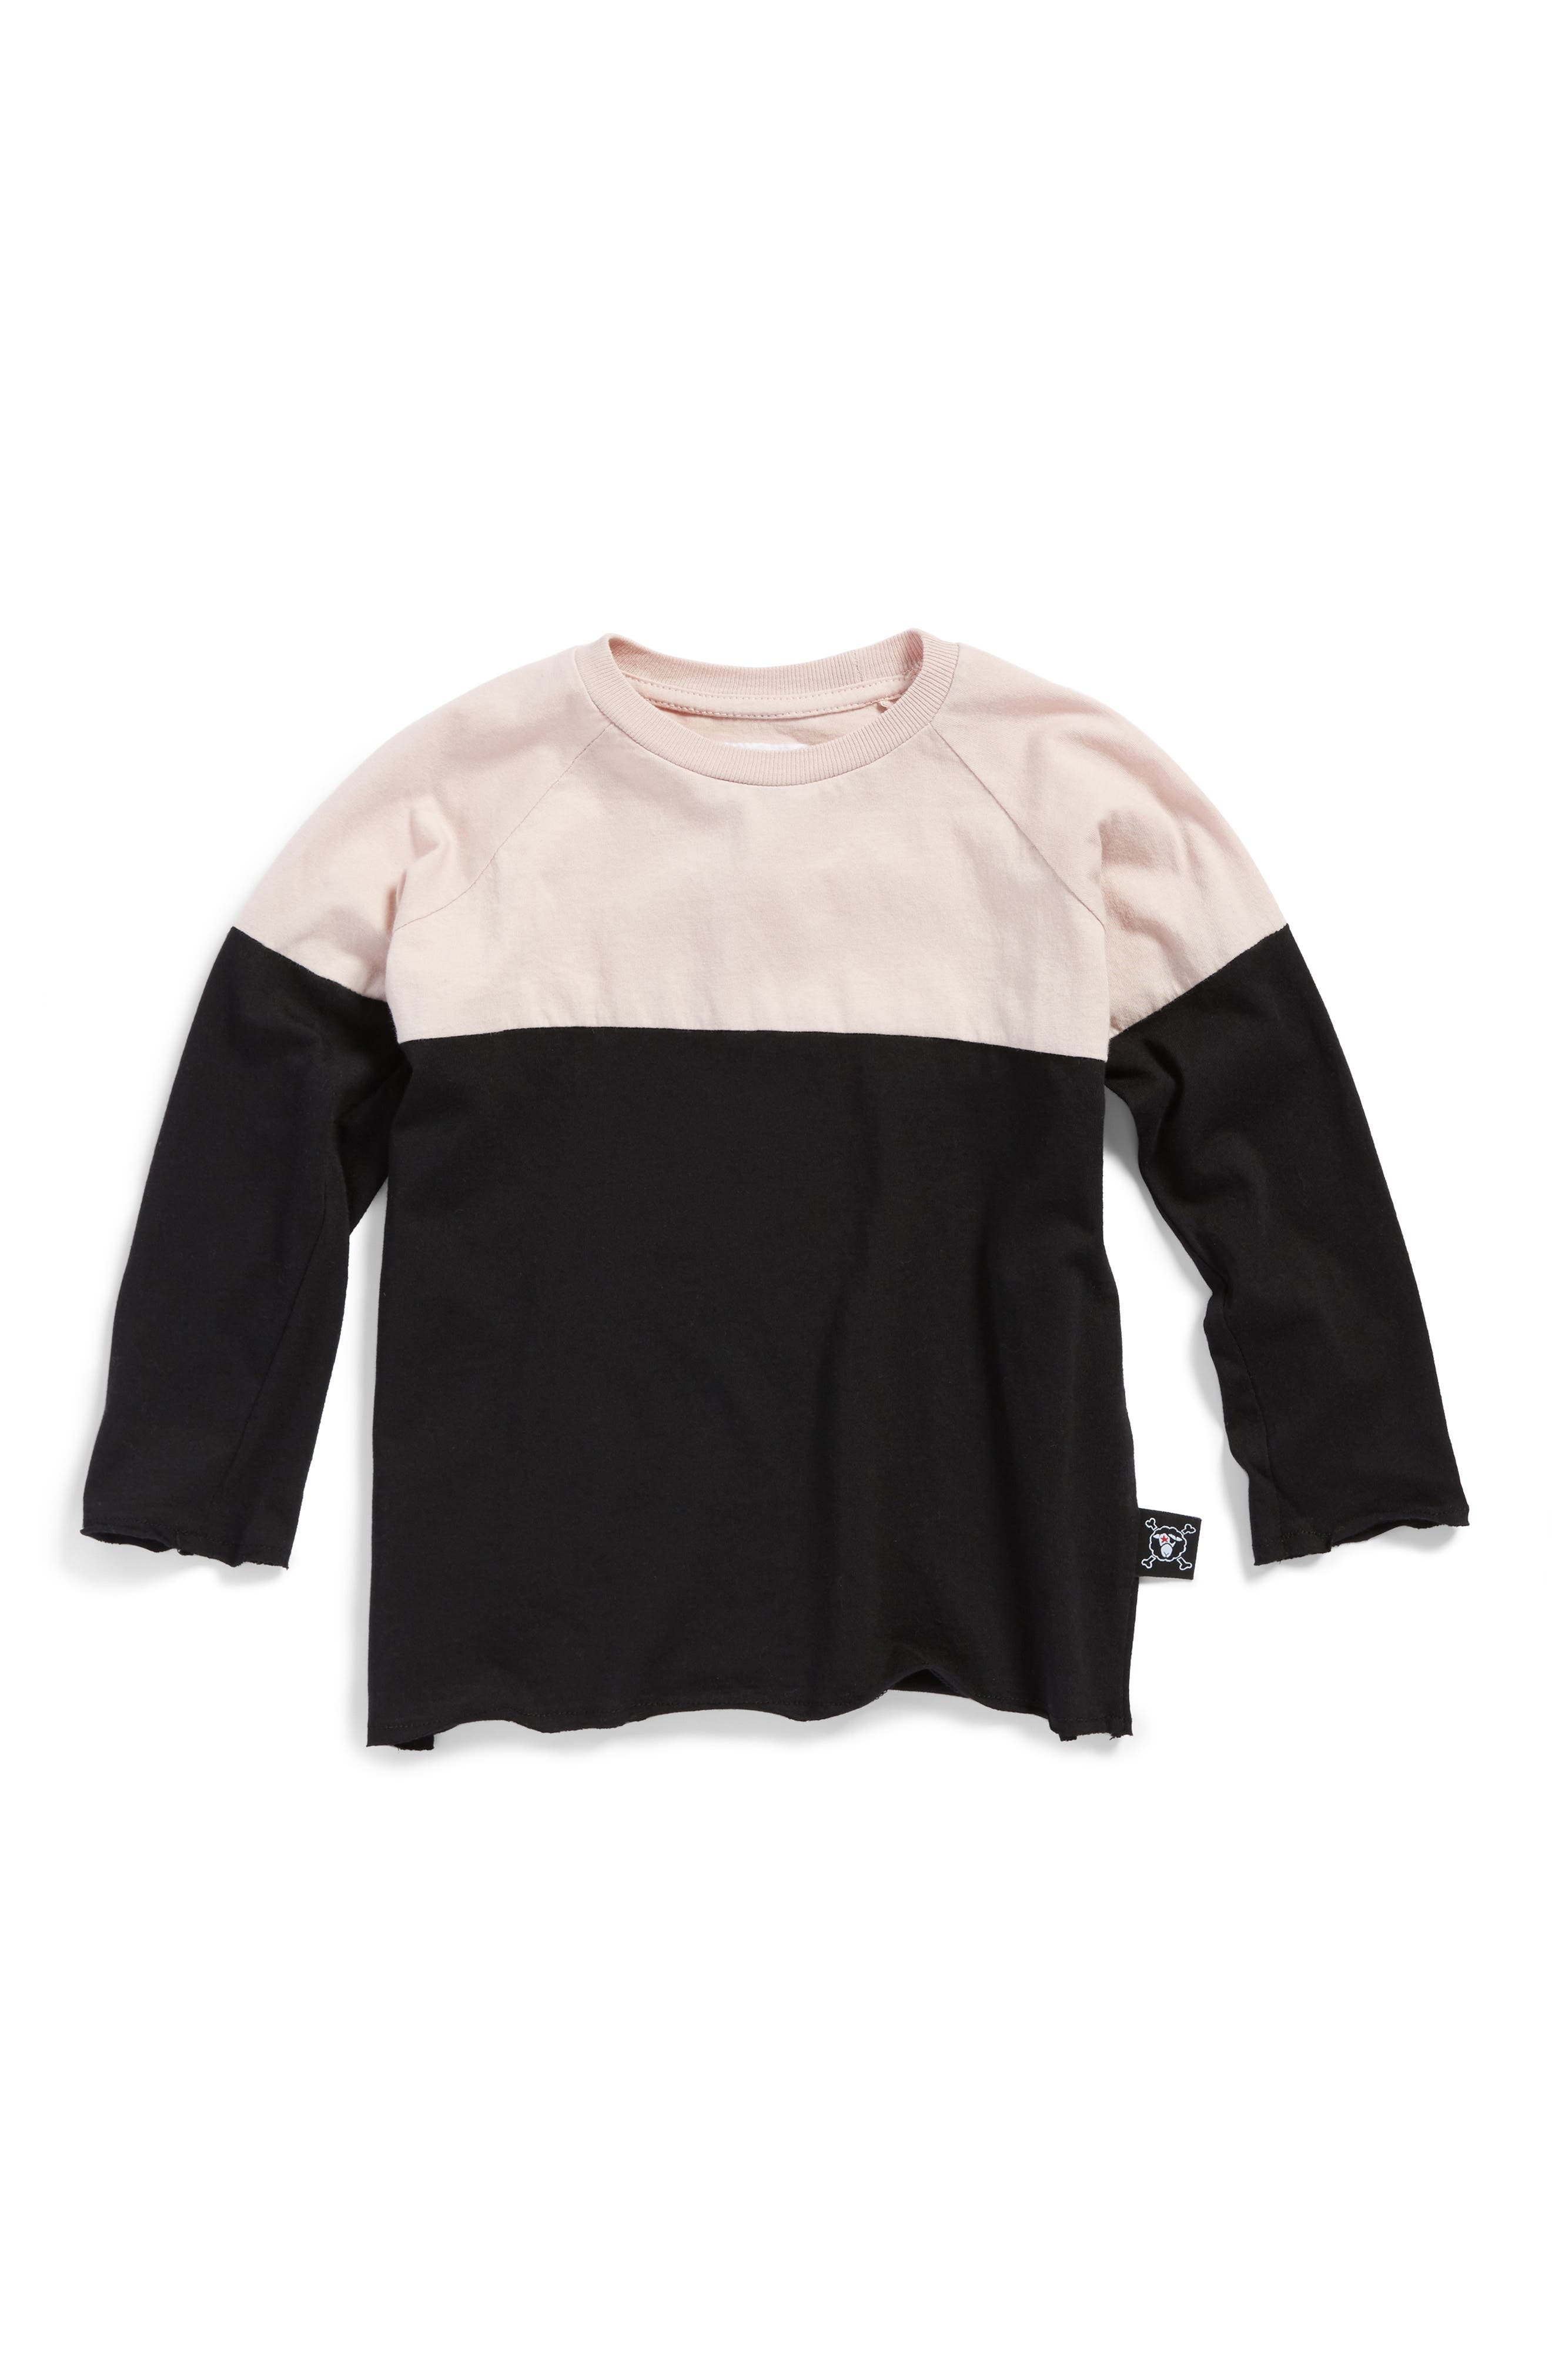 Main Image - NUNUNU Color Block Shirt (Toddler Girls & Little Girls)